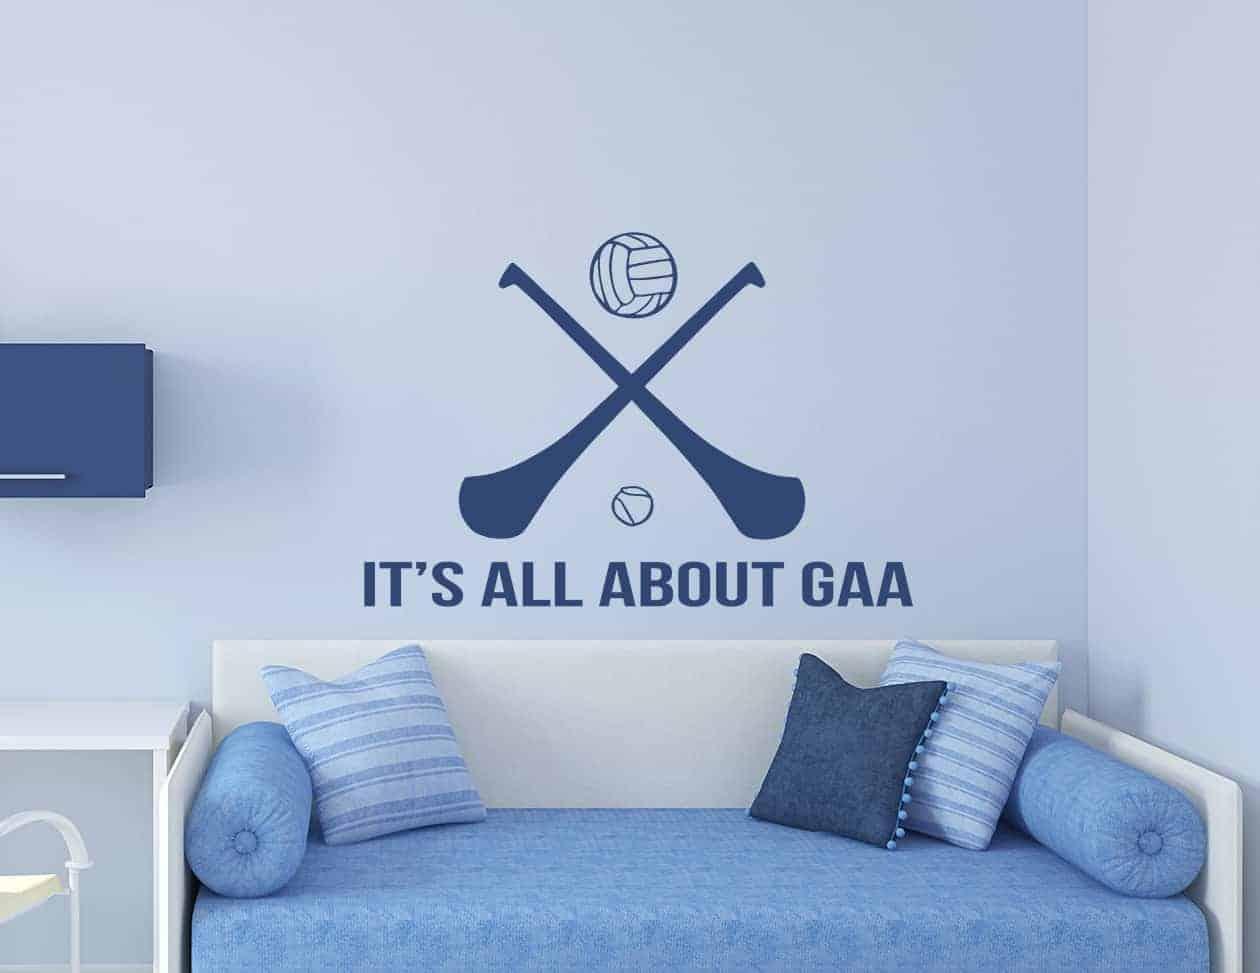 All about G.A.A. wall art decal sticker